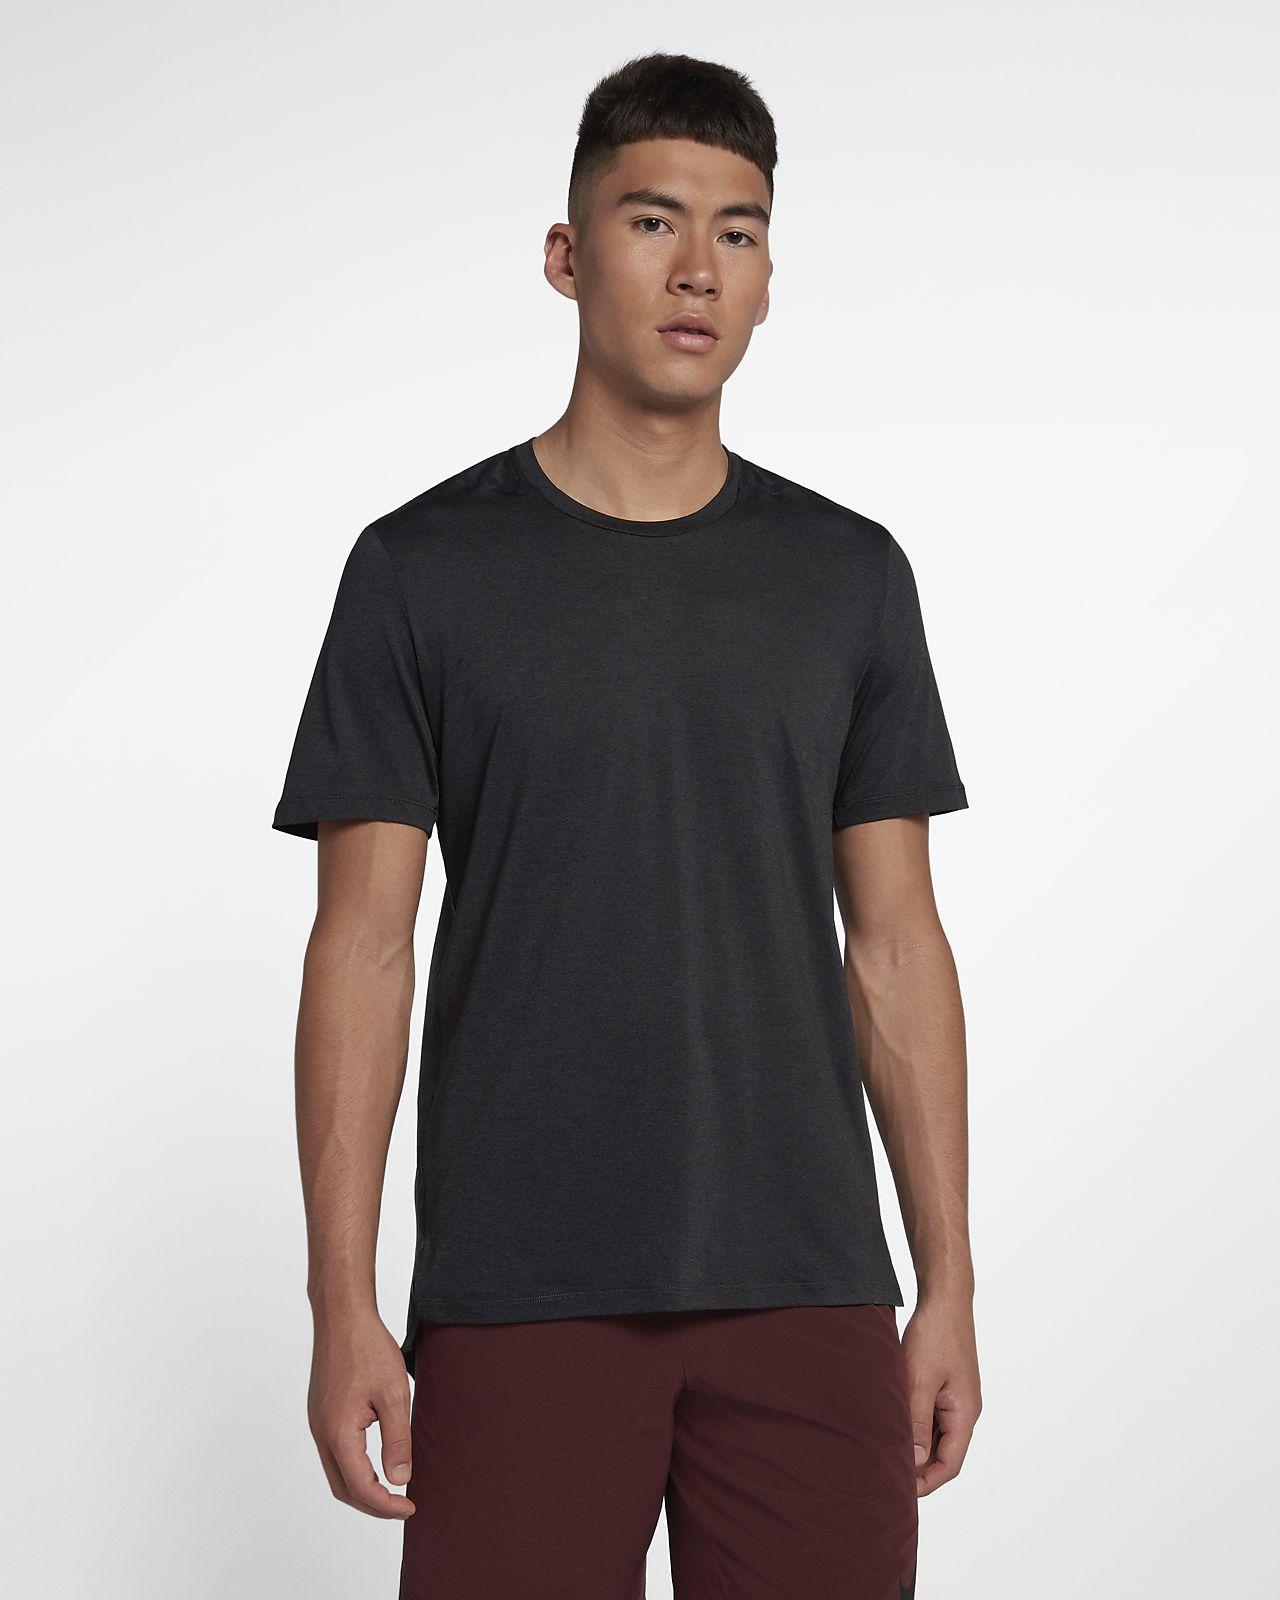 Nike Dri-FIT Premium Kurzarm-Trainingsoberteil für Herren